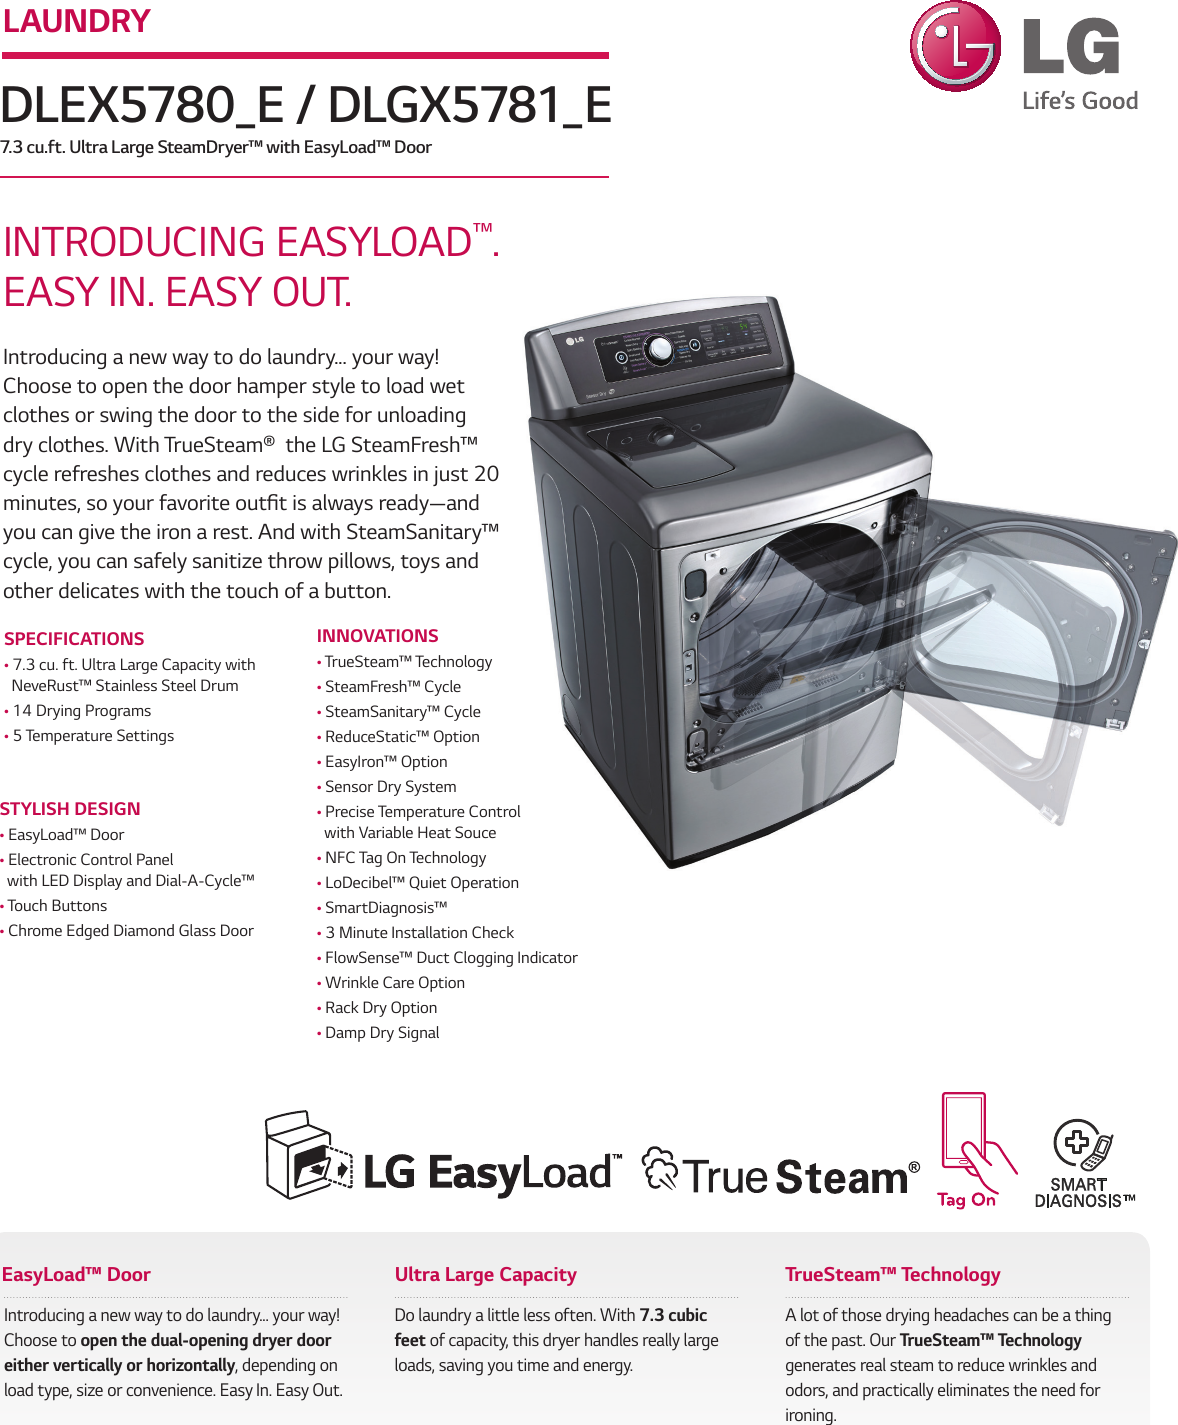 LG DLEX5780WE User Manual Specification DLEX5780 E DLGX5781 Spec Sheet